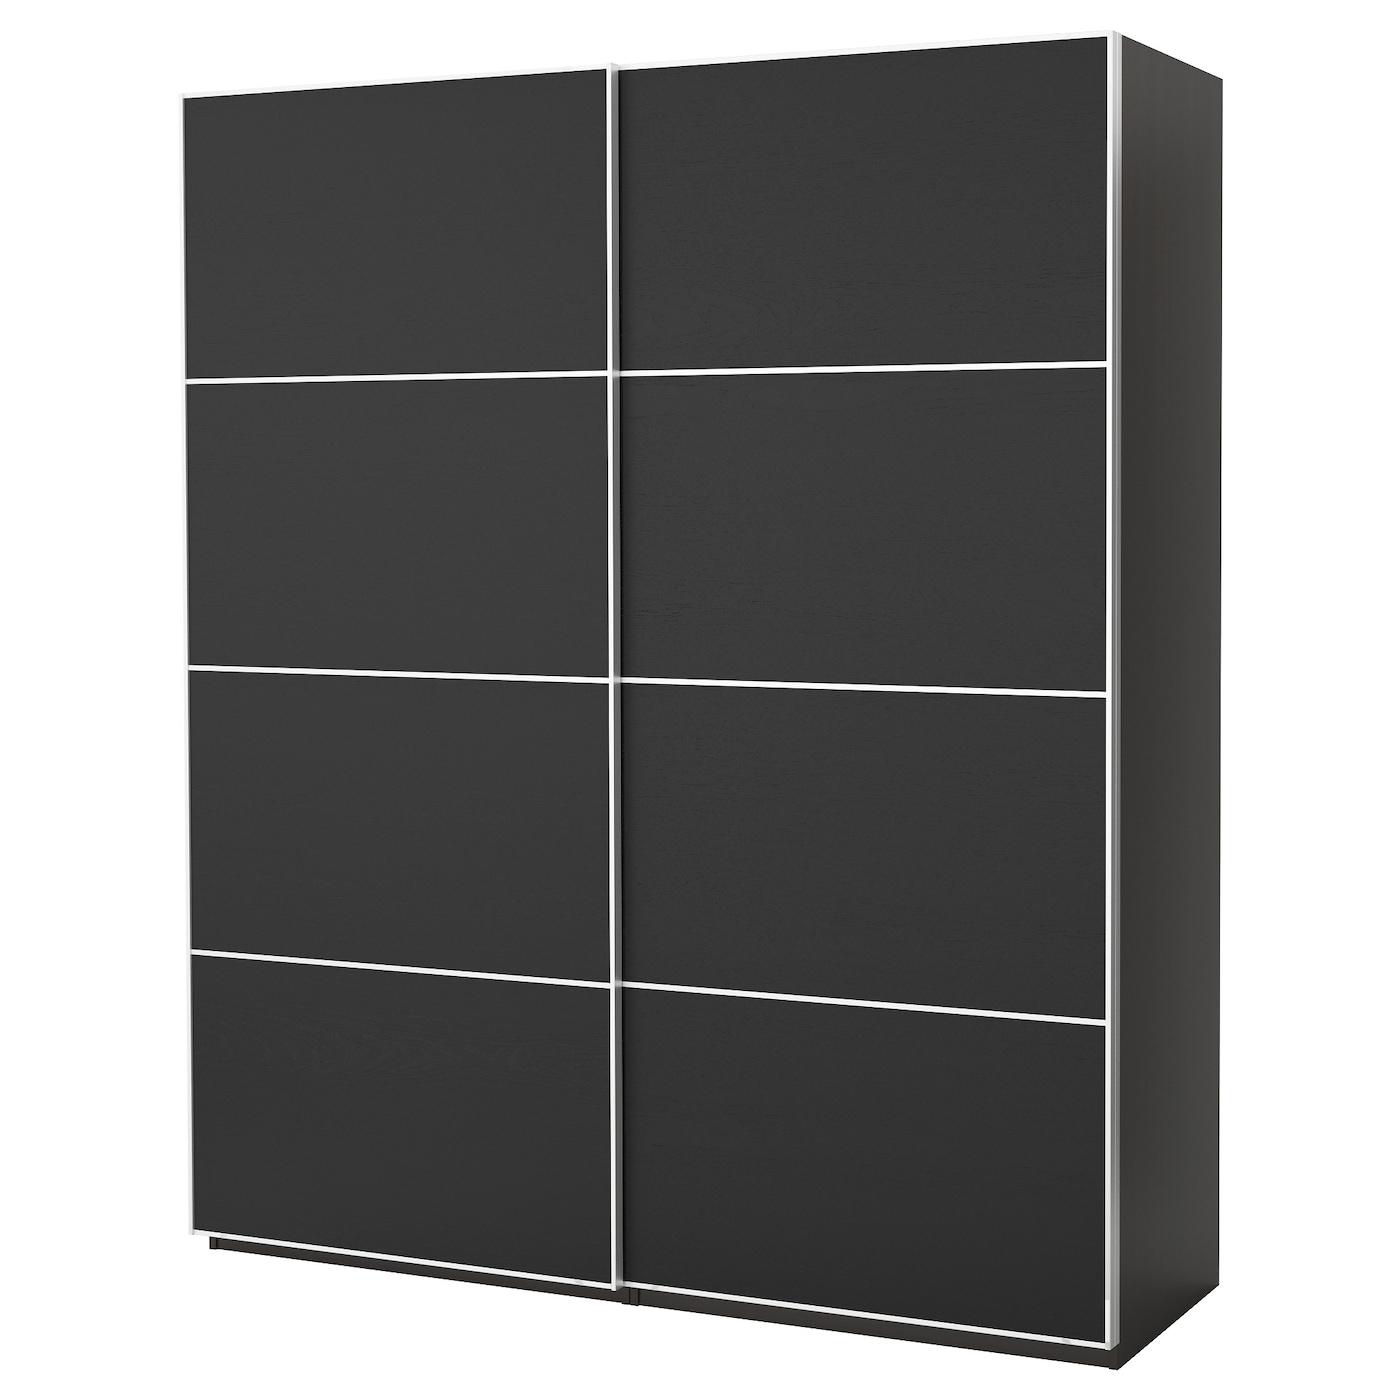 pax kledingkast zwartbruin ilseng zwartbruin 200x66x236 cm ikea. Black Bedroom Furniture Sets. Home Design Ideas